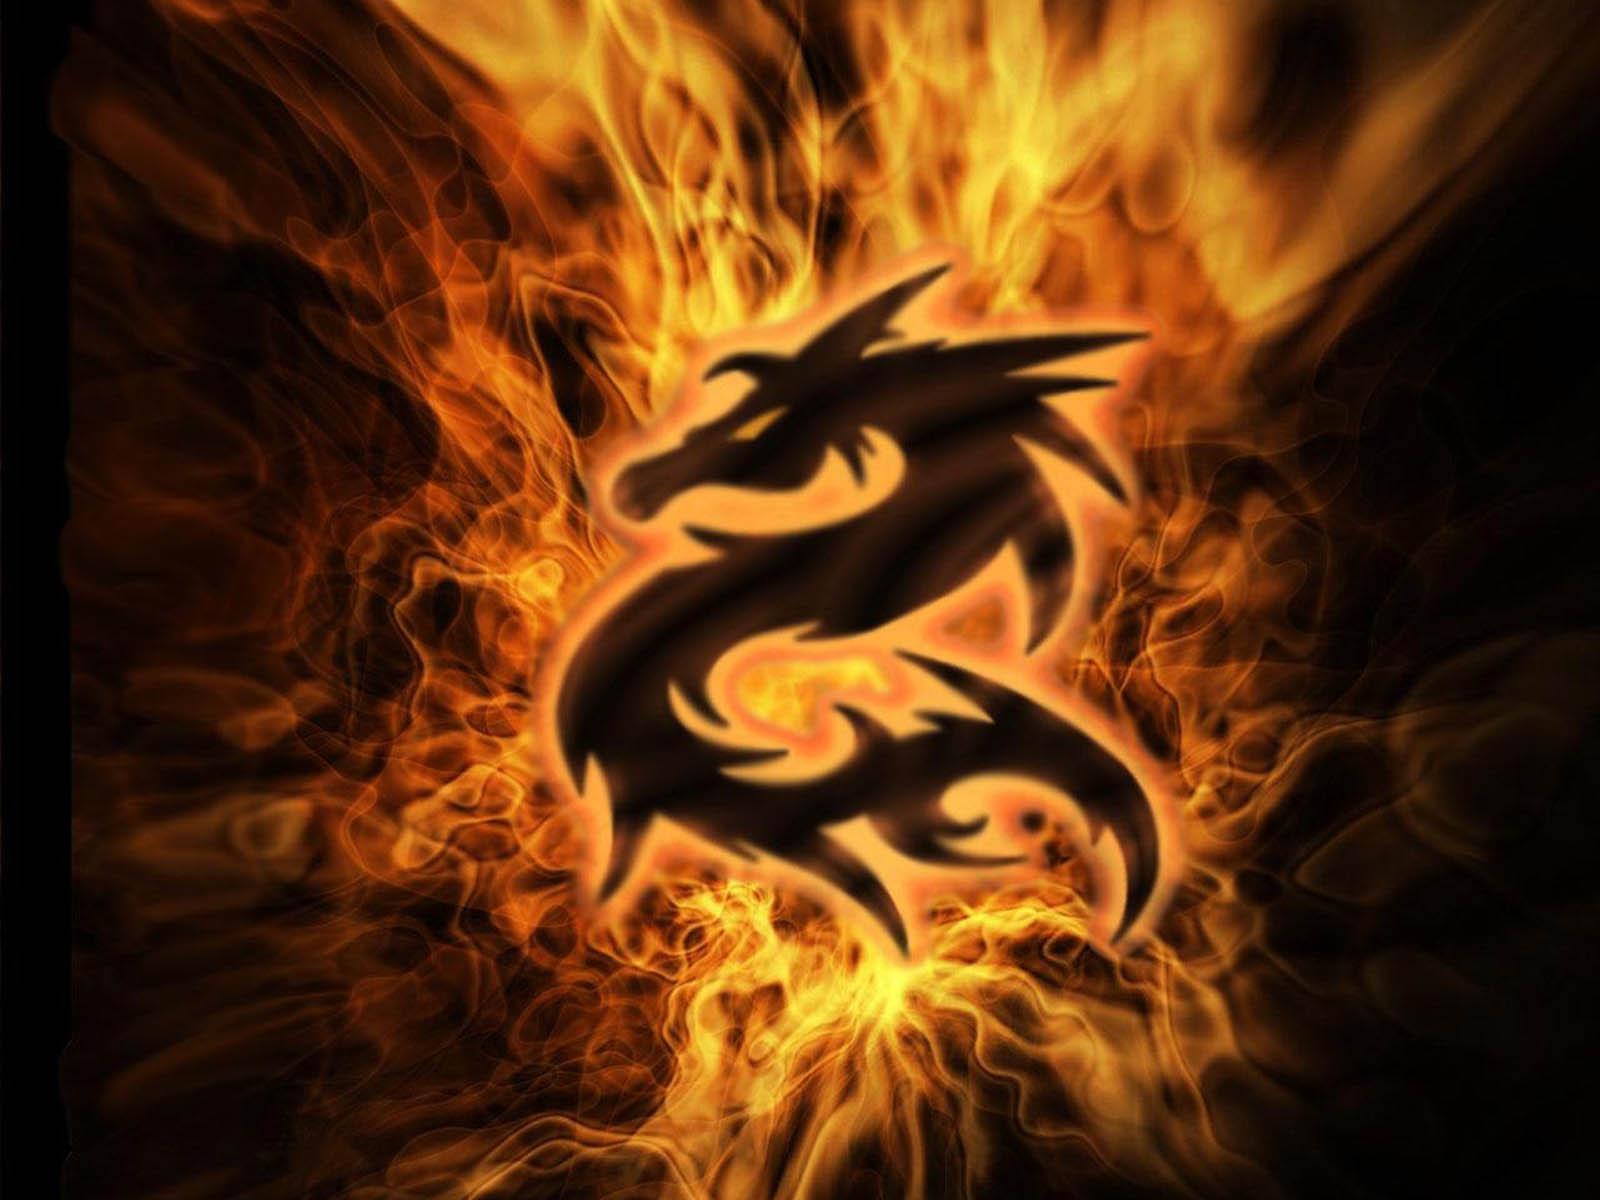 77 ] Free Dragon Wallpaper On WallpaperSafari